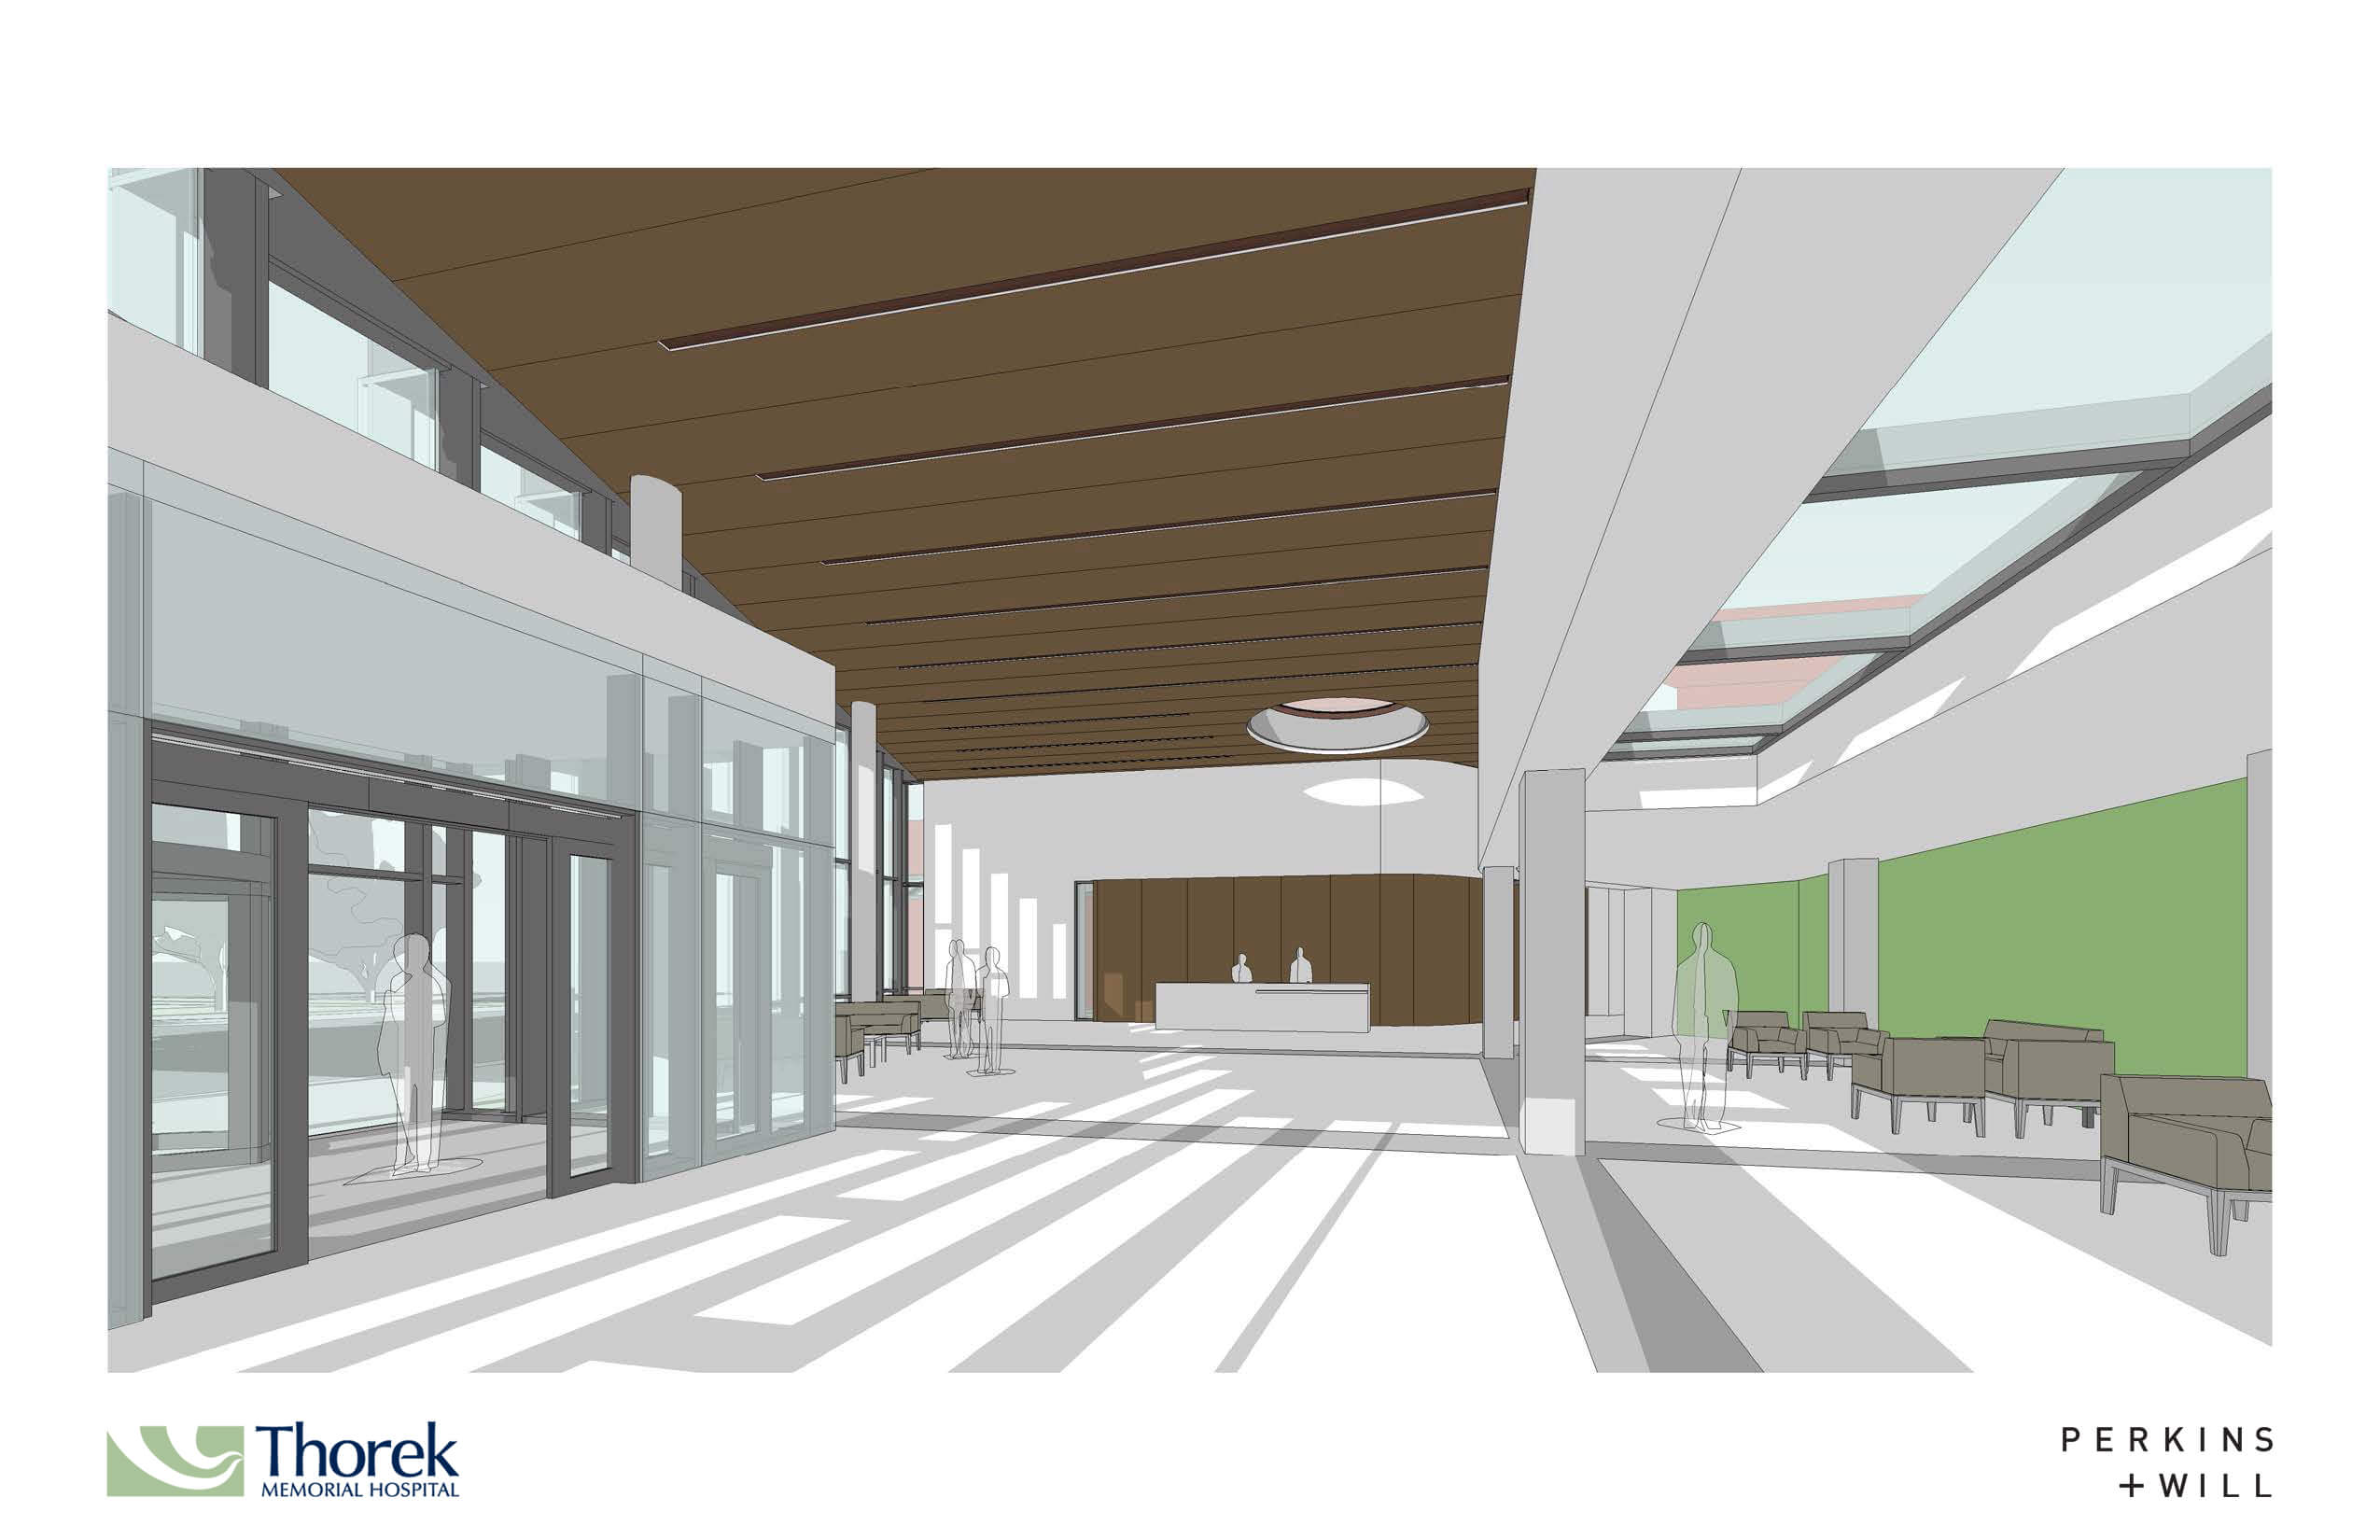 $5 Million Updated Hospital Entry Construction Starting June 25, 2018